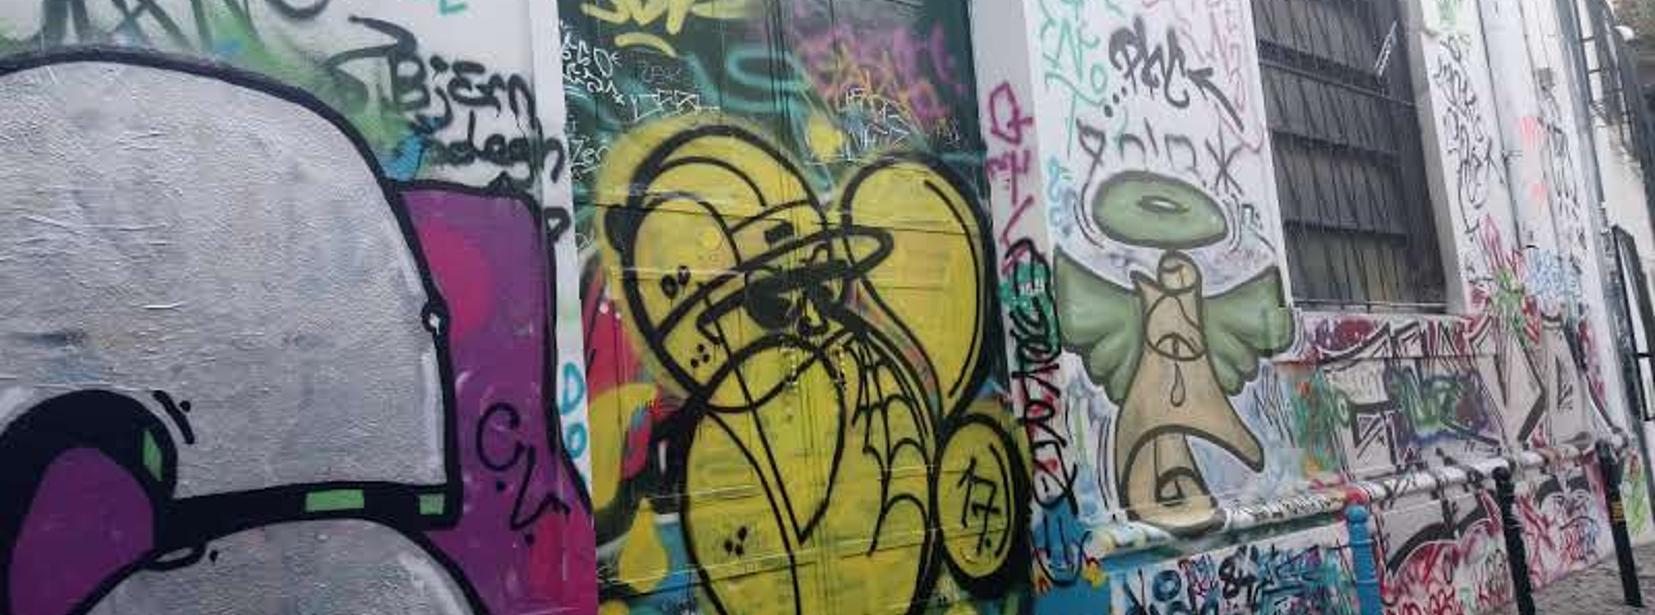 Travessa do fala só graffiti free wall